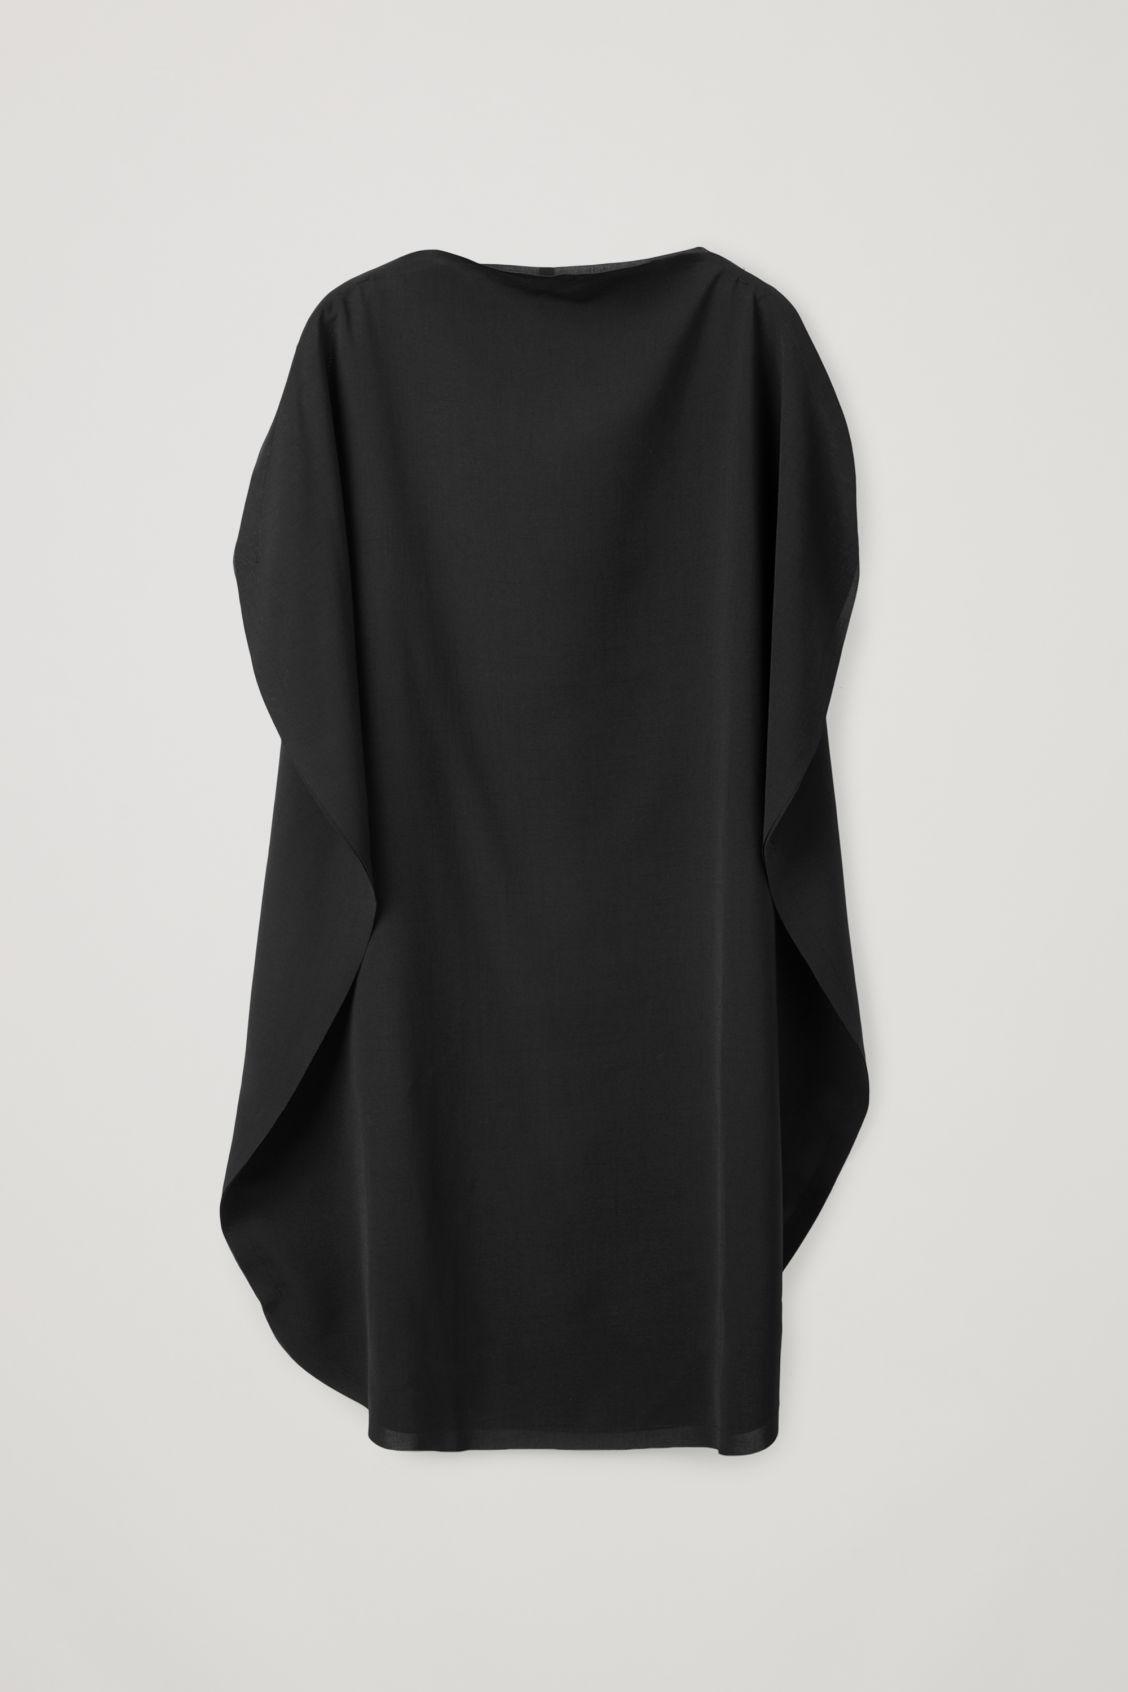 Cos Circle-cut Dress In Black